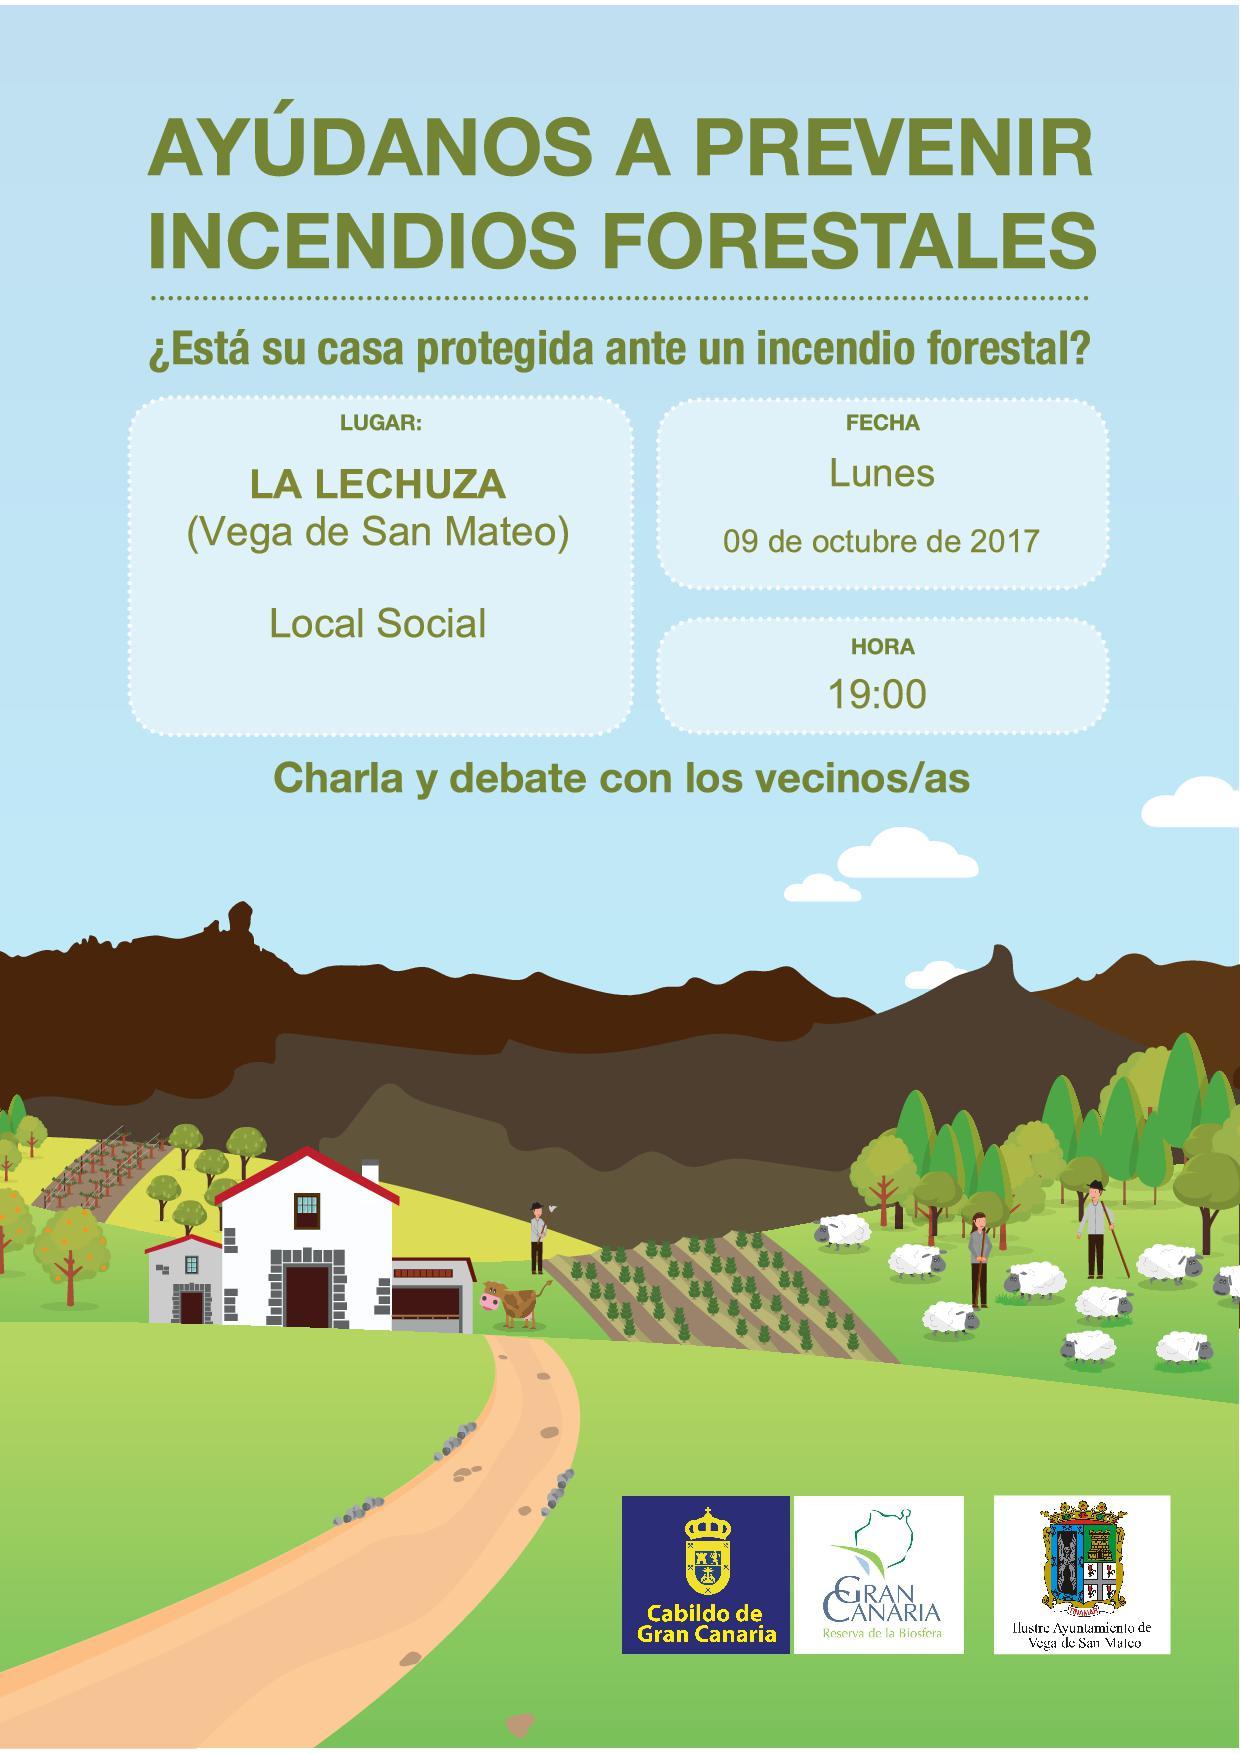 CARTEL CHARLAS SAN MATEO La Lechuza 19.00